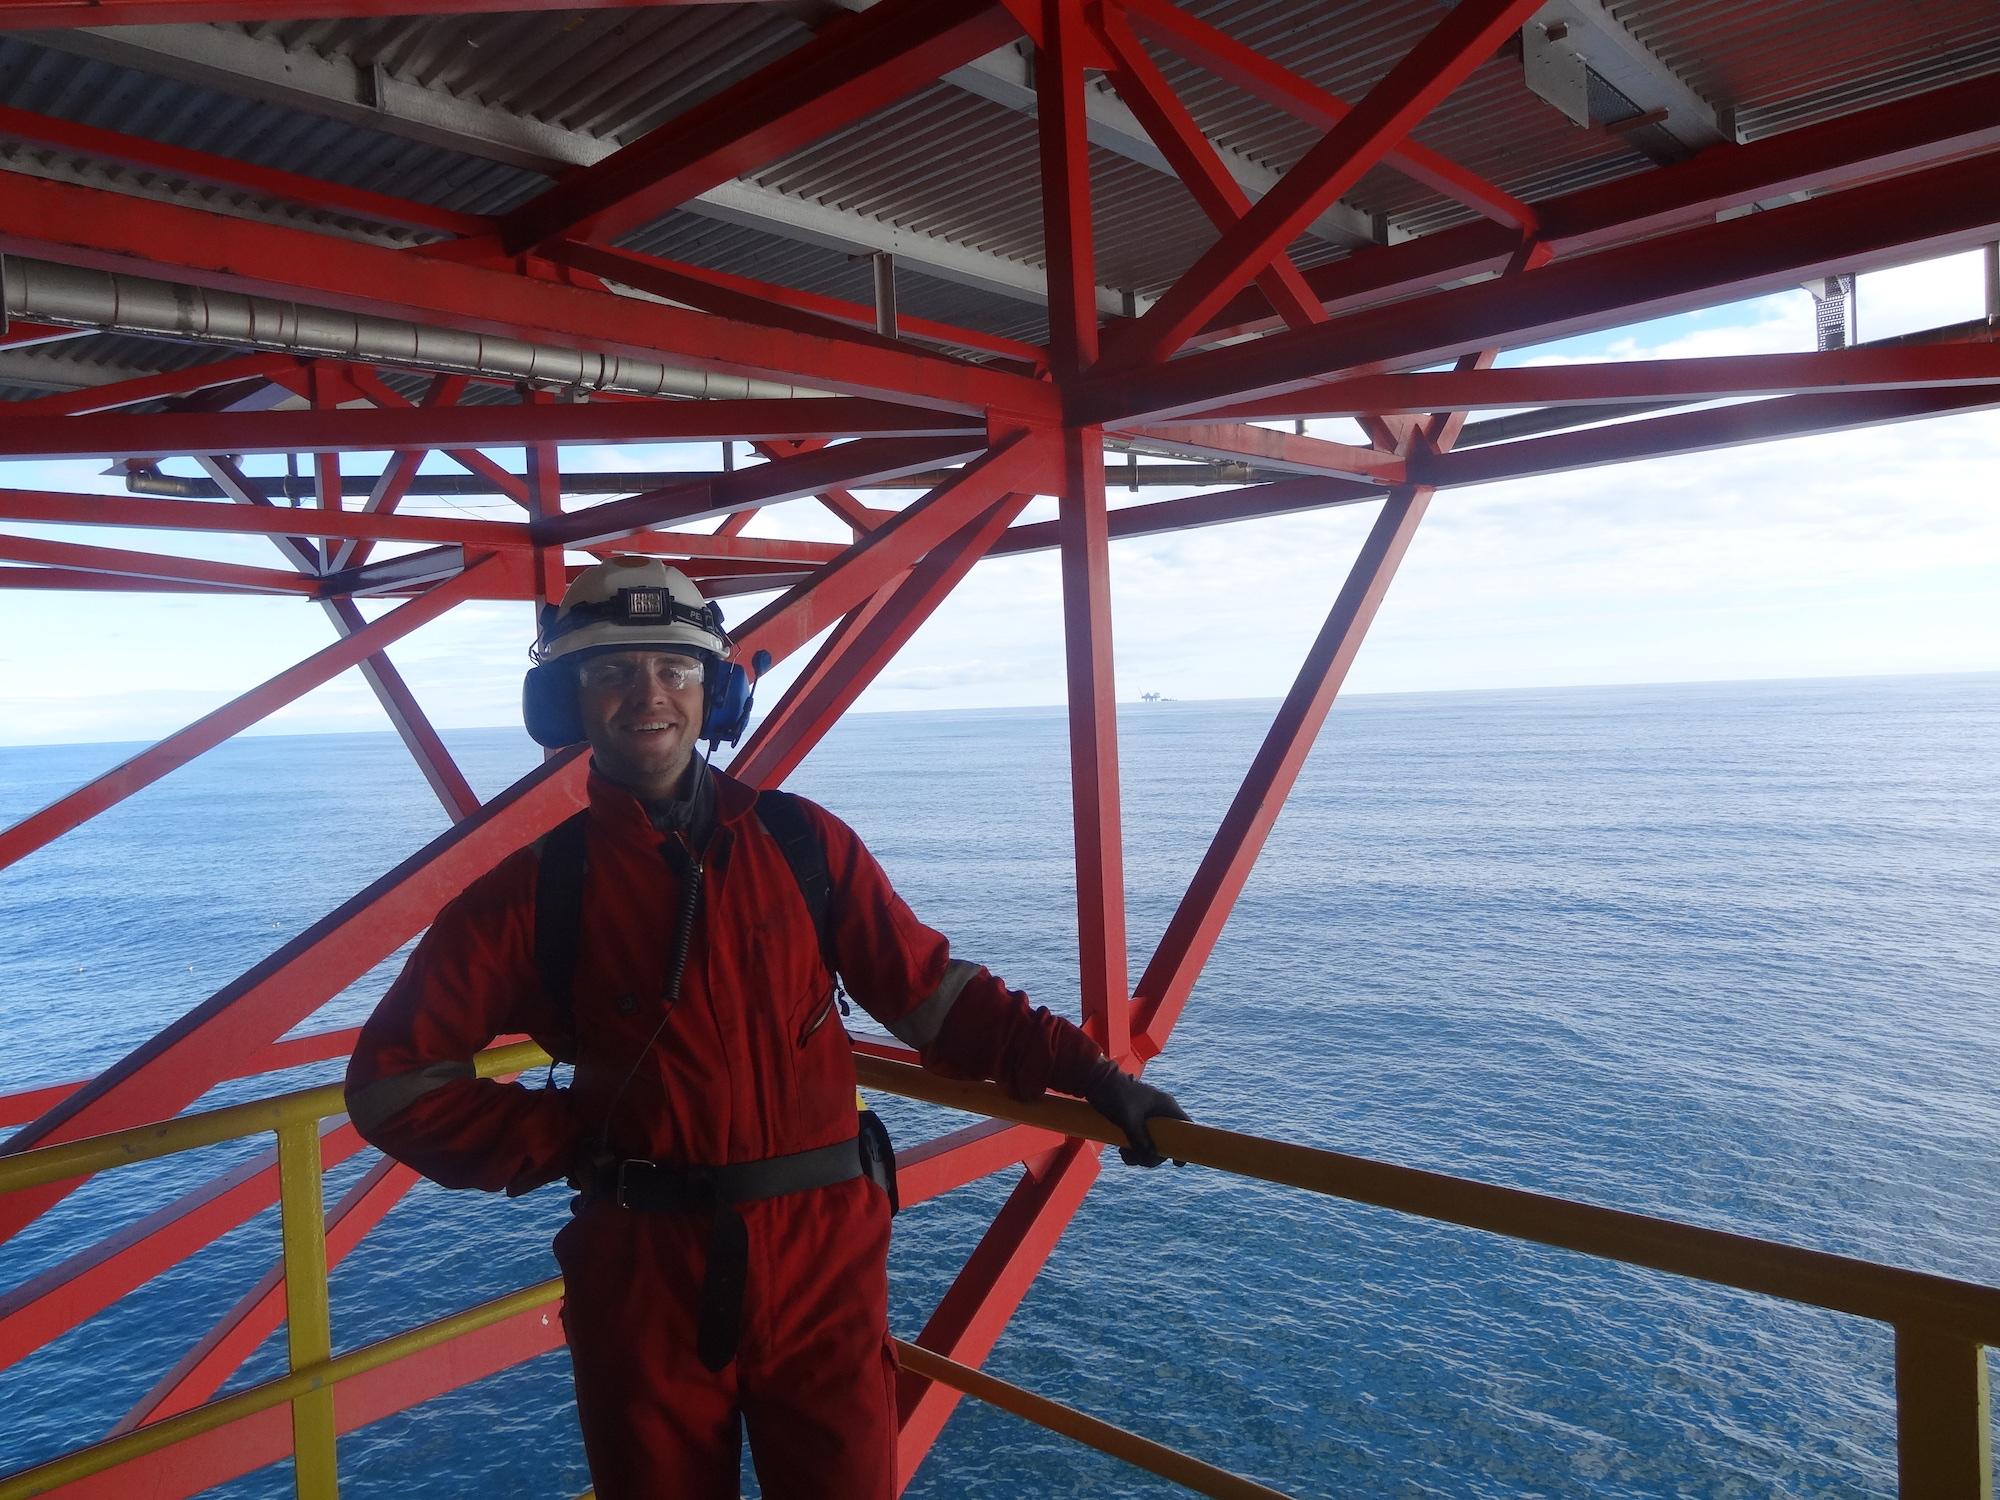 4Subsea engineer offshore